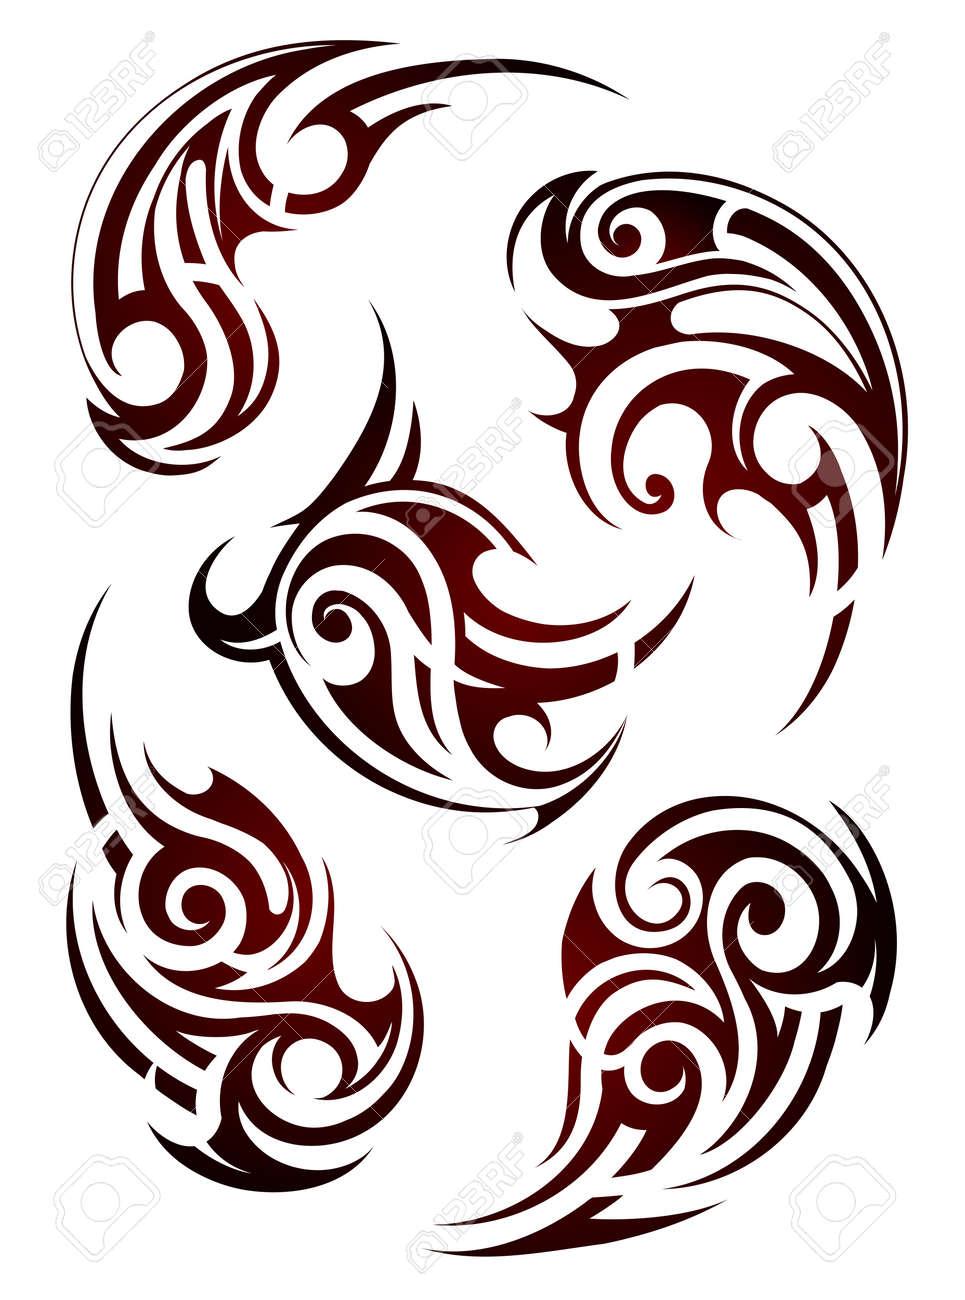 Set of Maori ethnic style tattoo shapes - 54539987